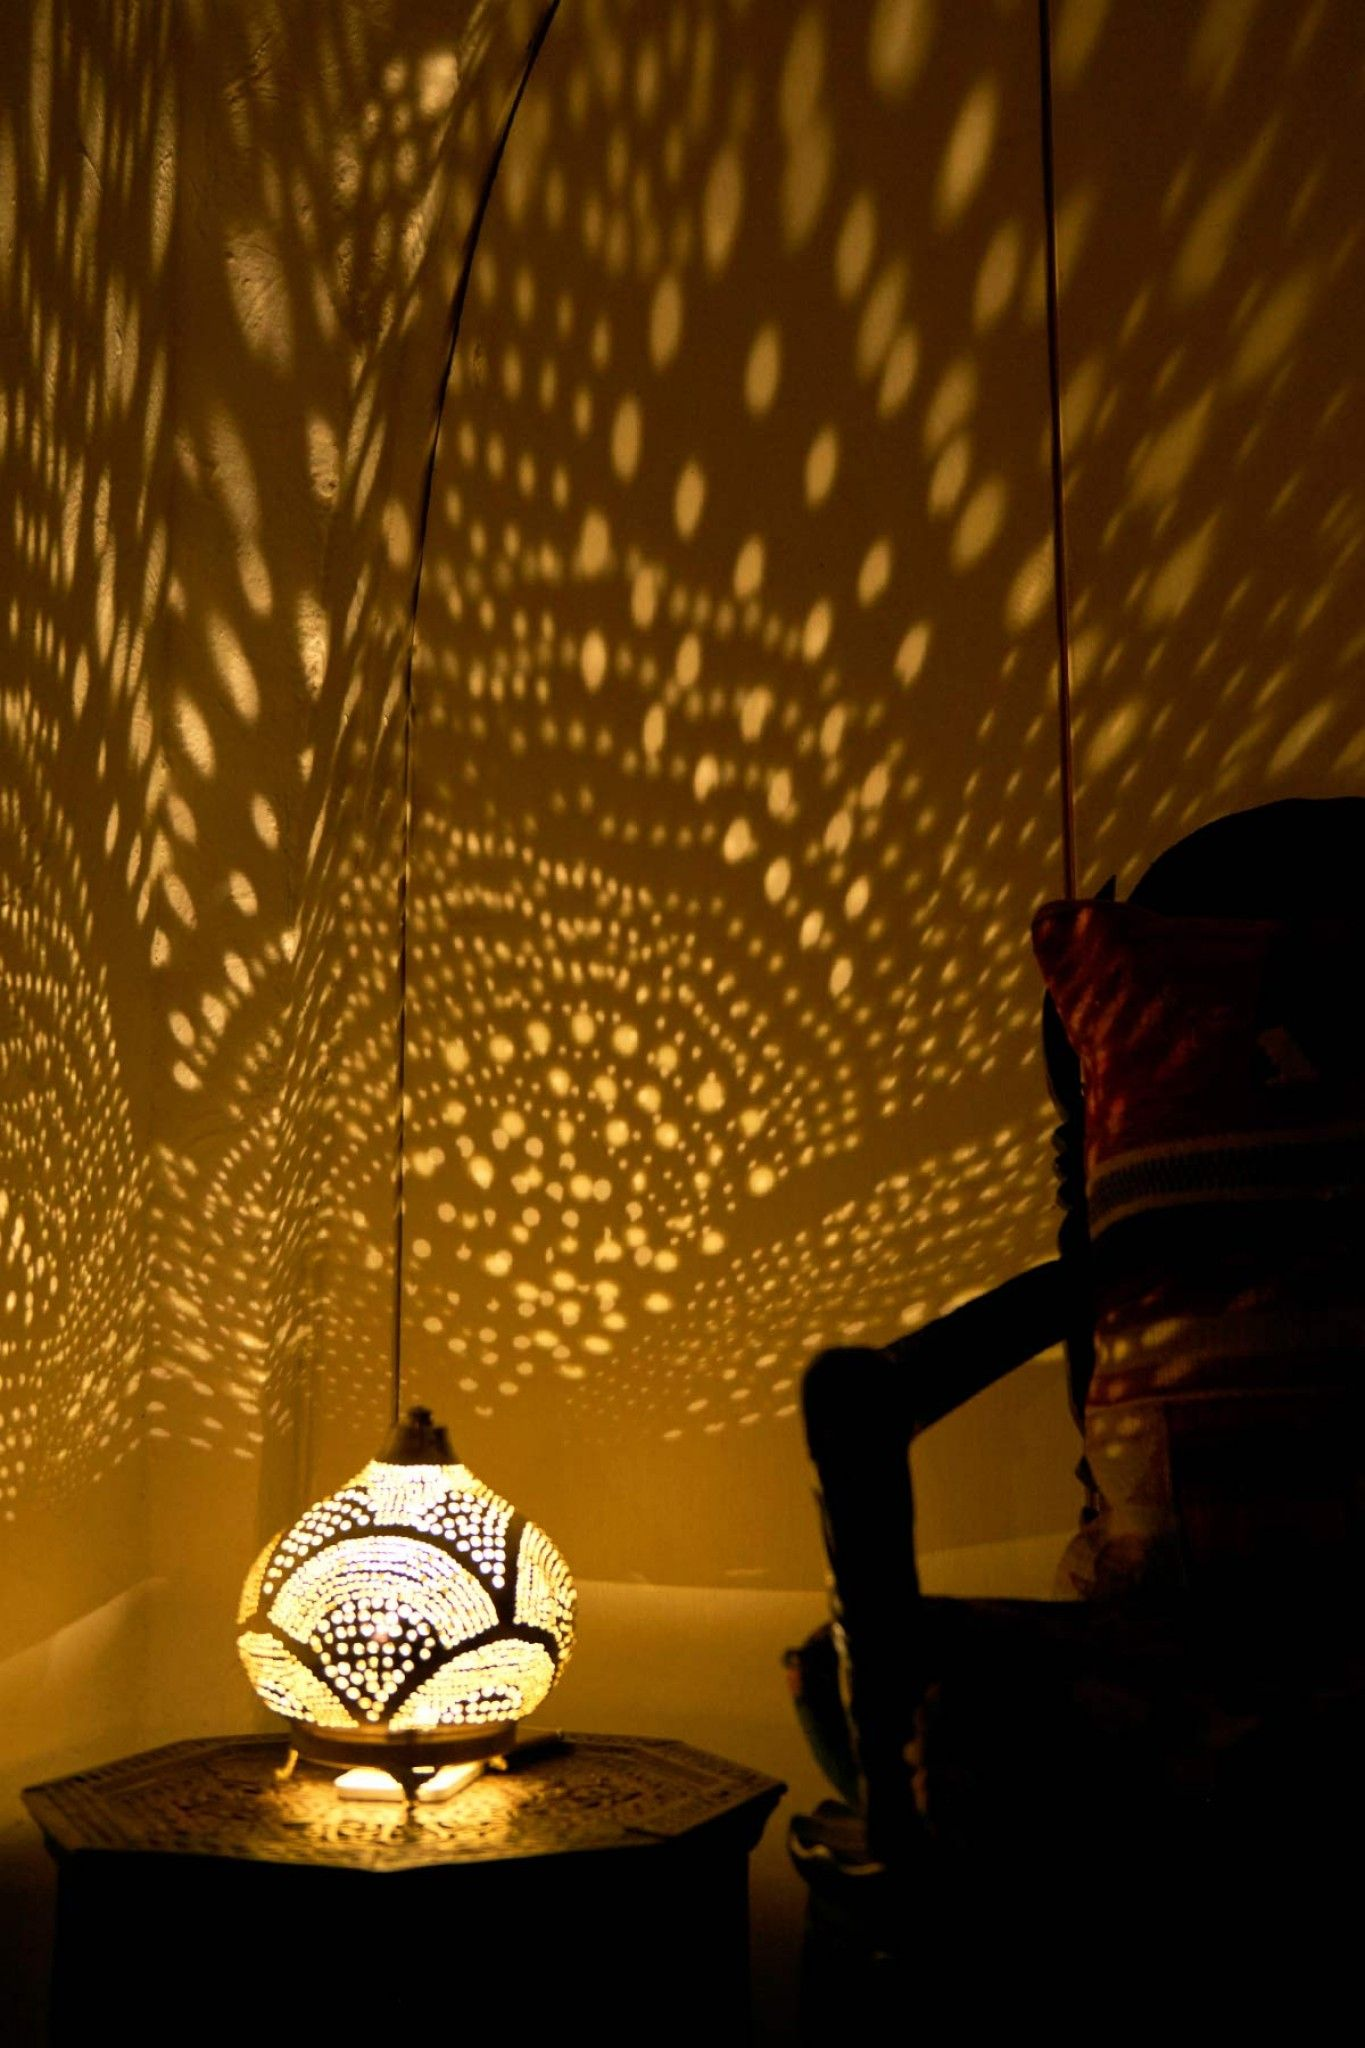 Punched Metal Turkish Table Lamp Meditation Room Meditation